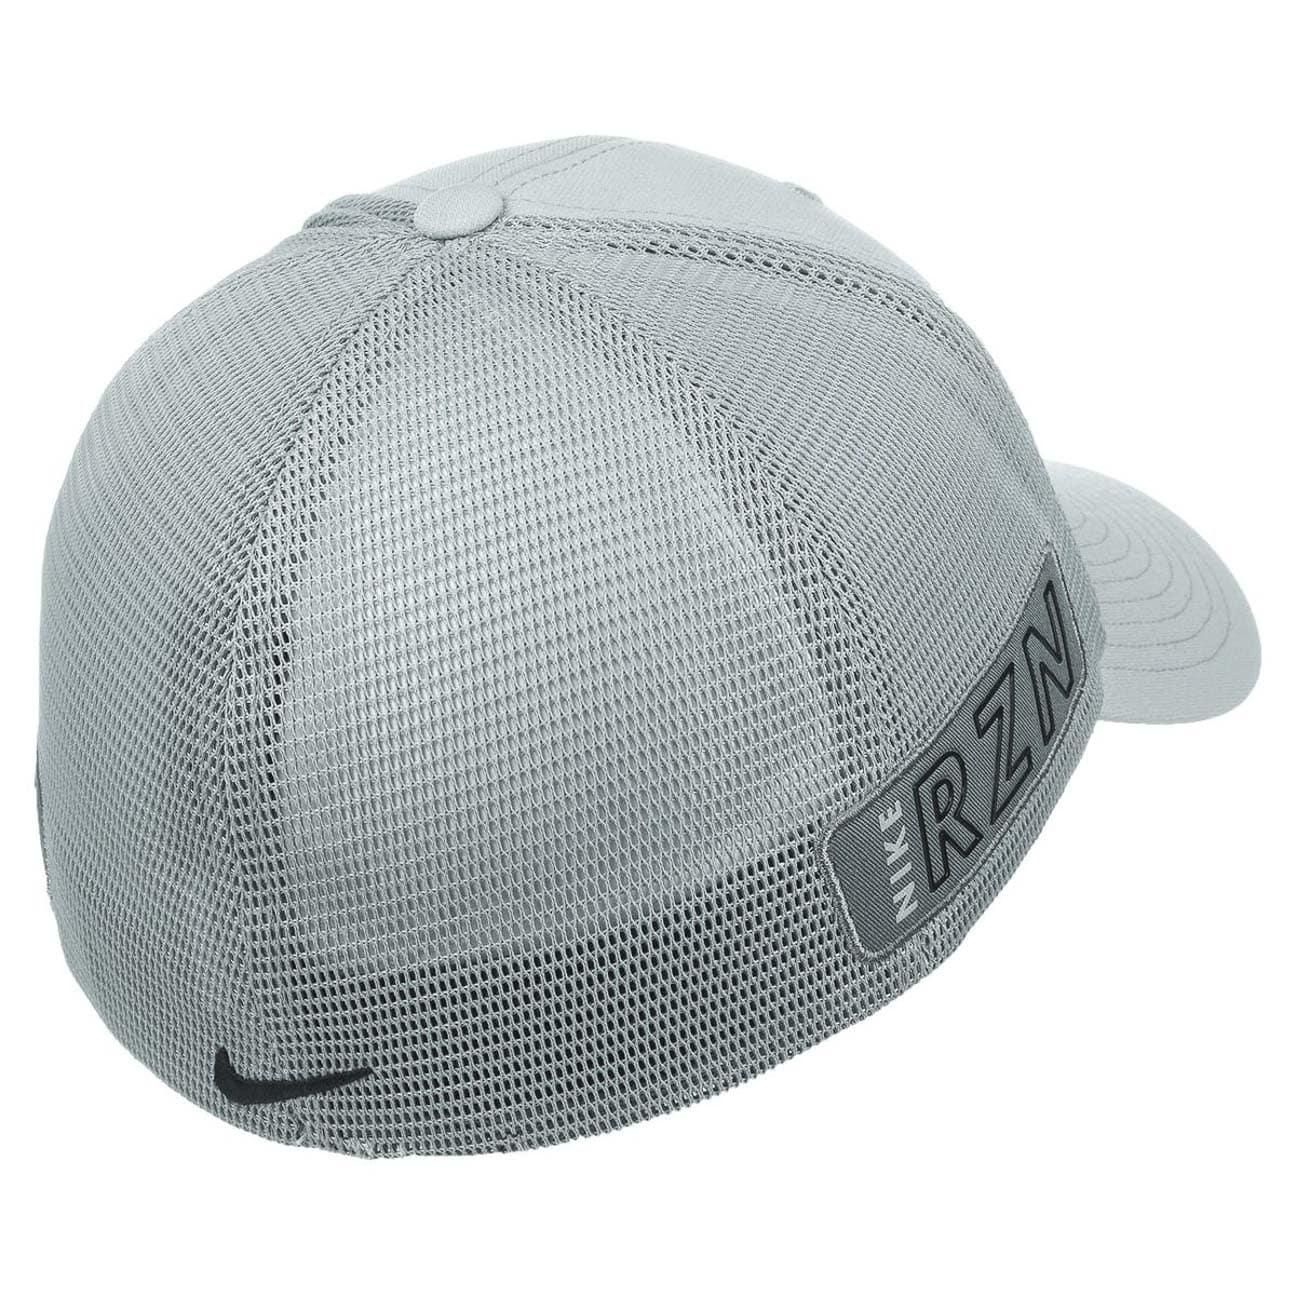 Nike Legacy  Tour Mesh Hat